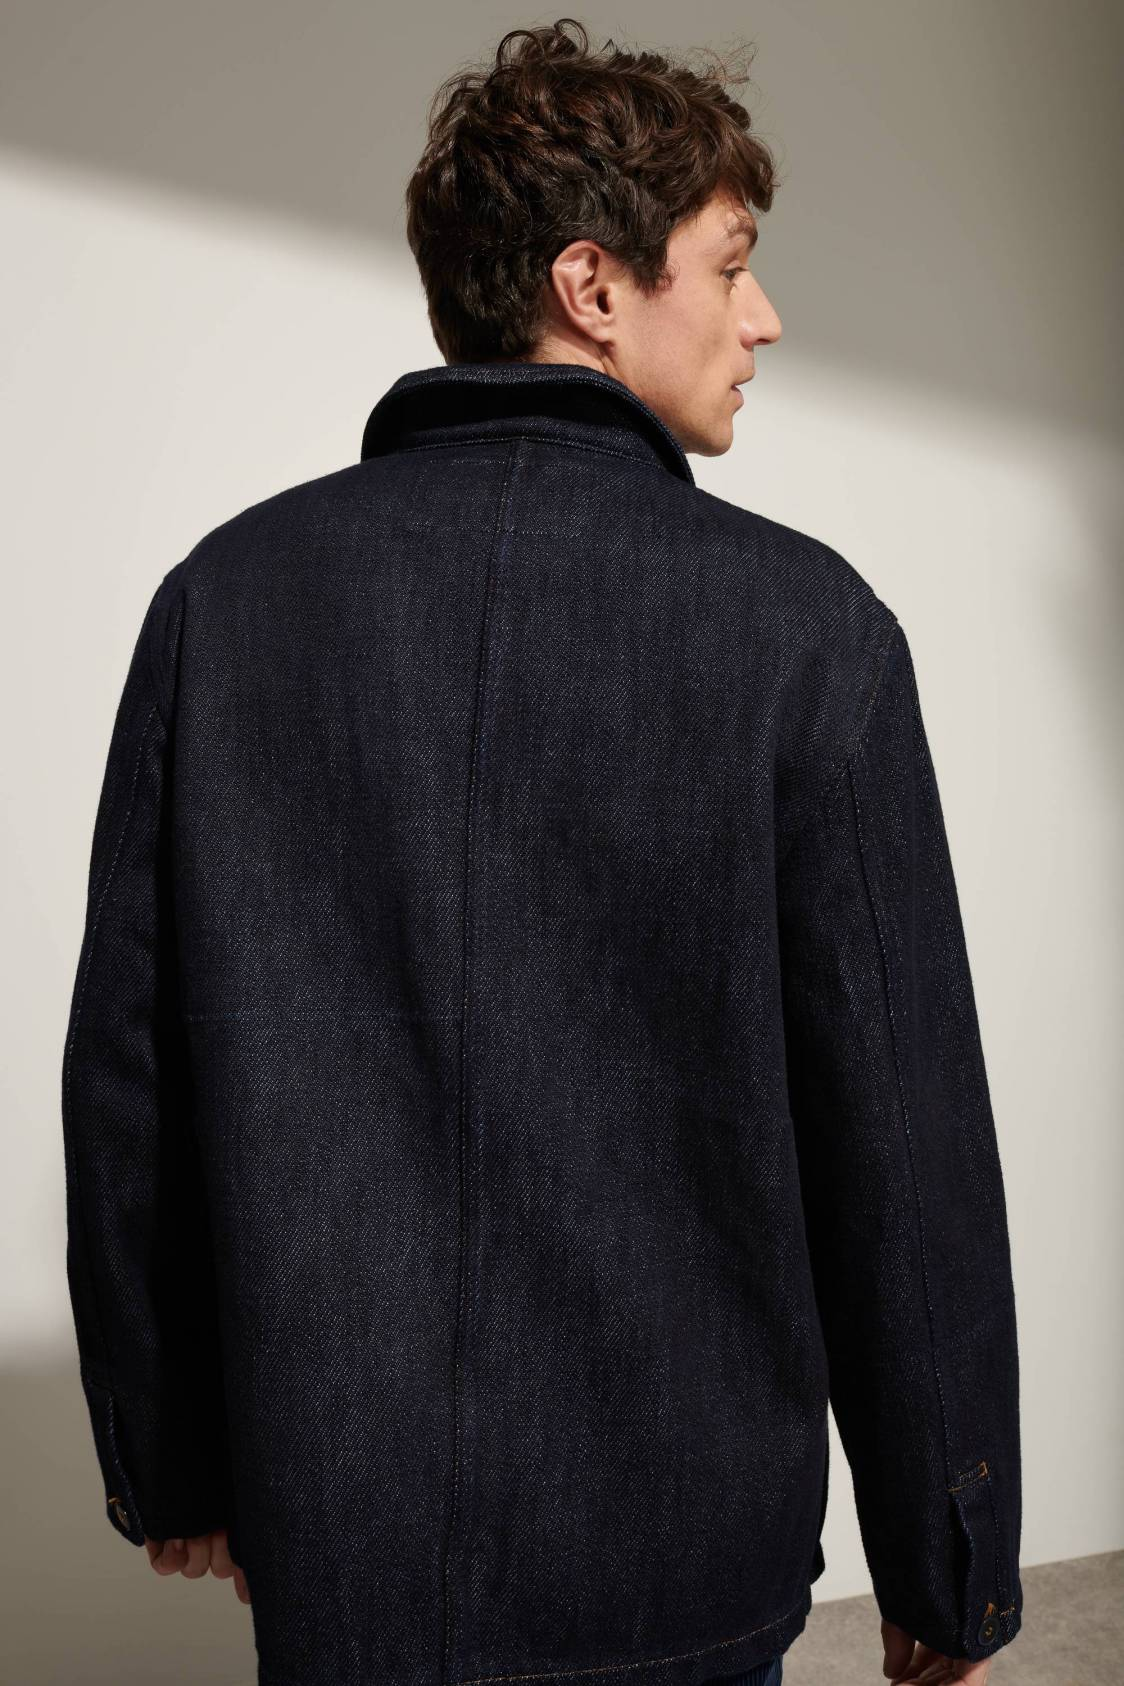 16-Oz Denim Work Jacket